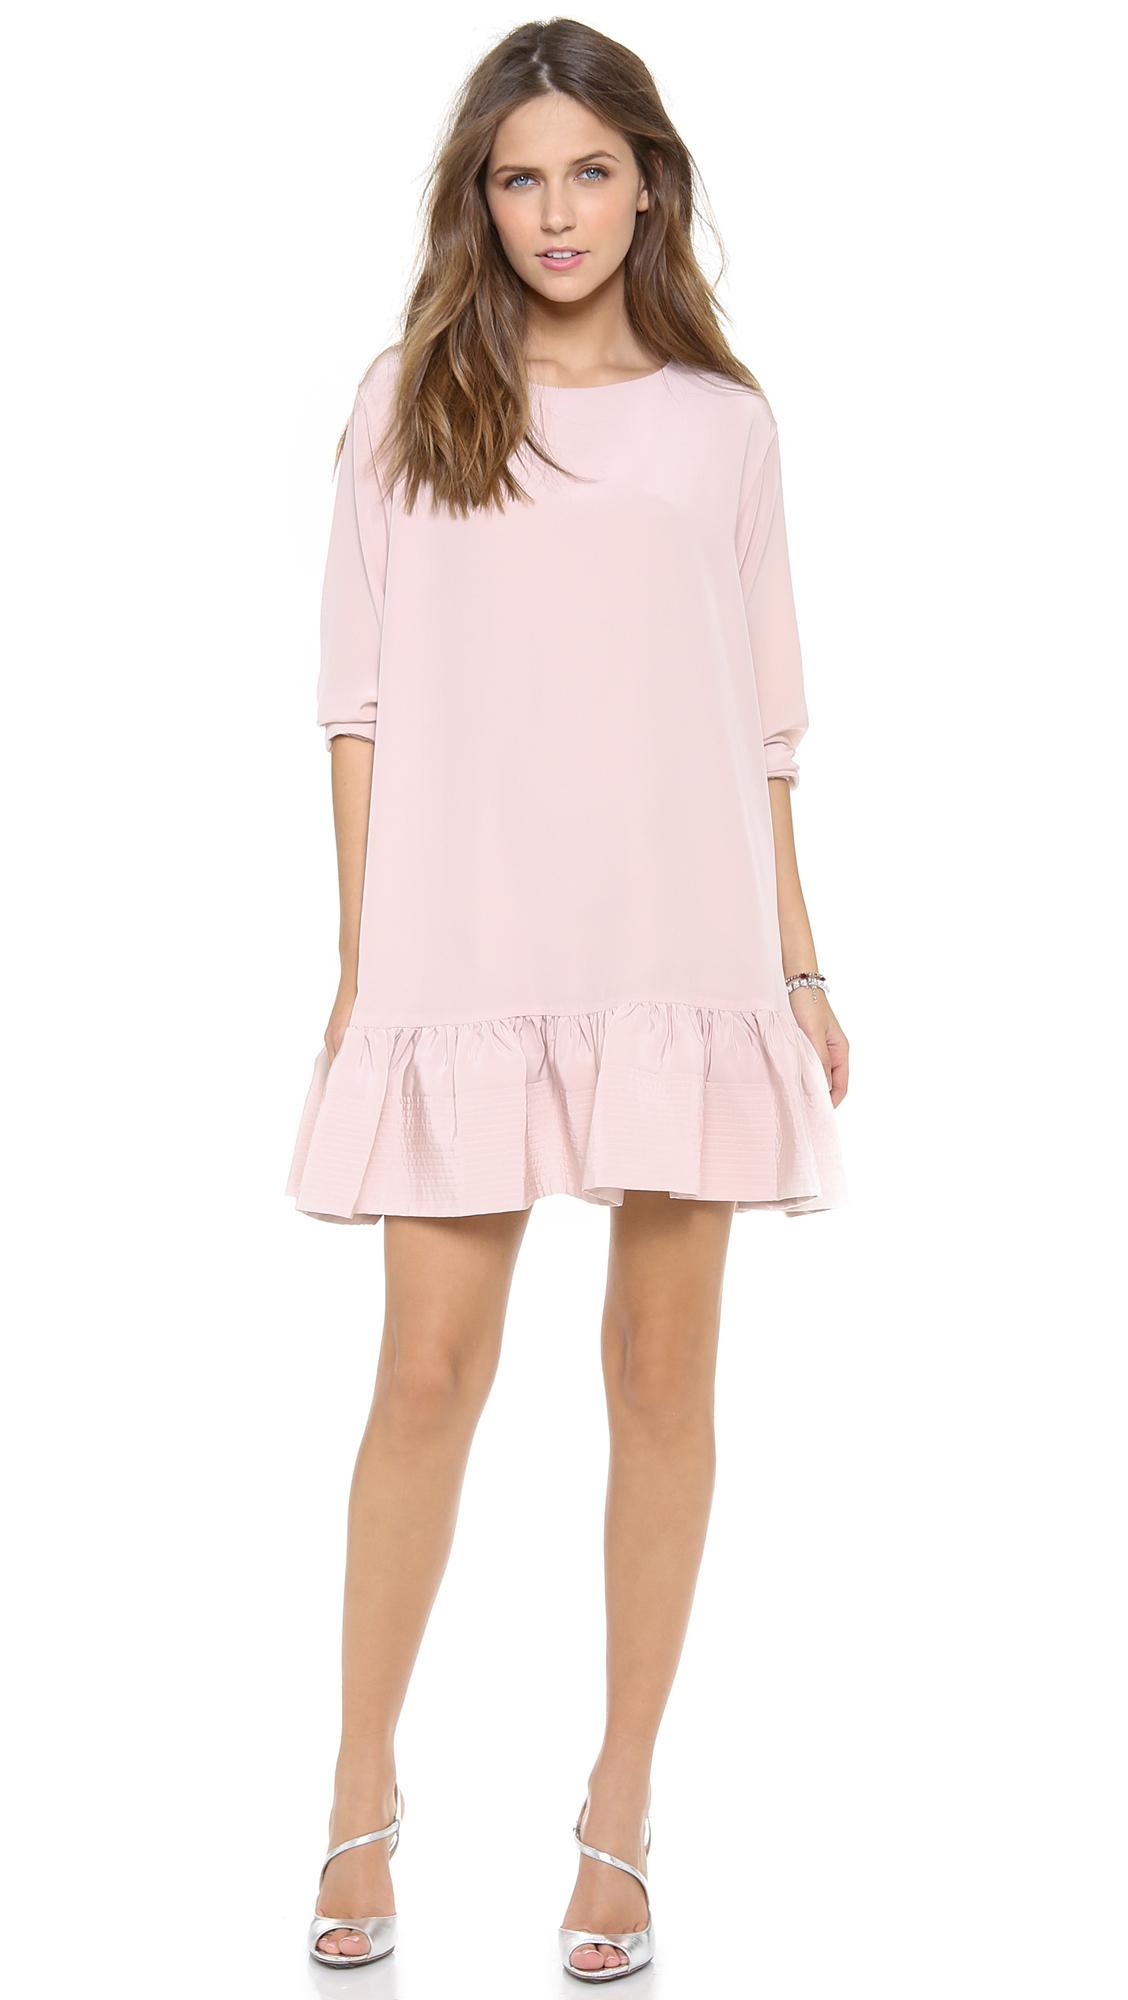 Light Pinky Brown Lip Makeup: Cynthia Rowley Long Sleeve Flounce Dress Light Pink